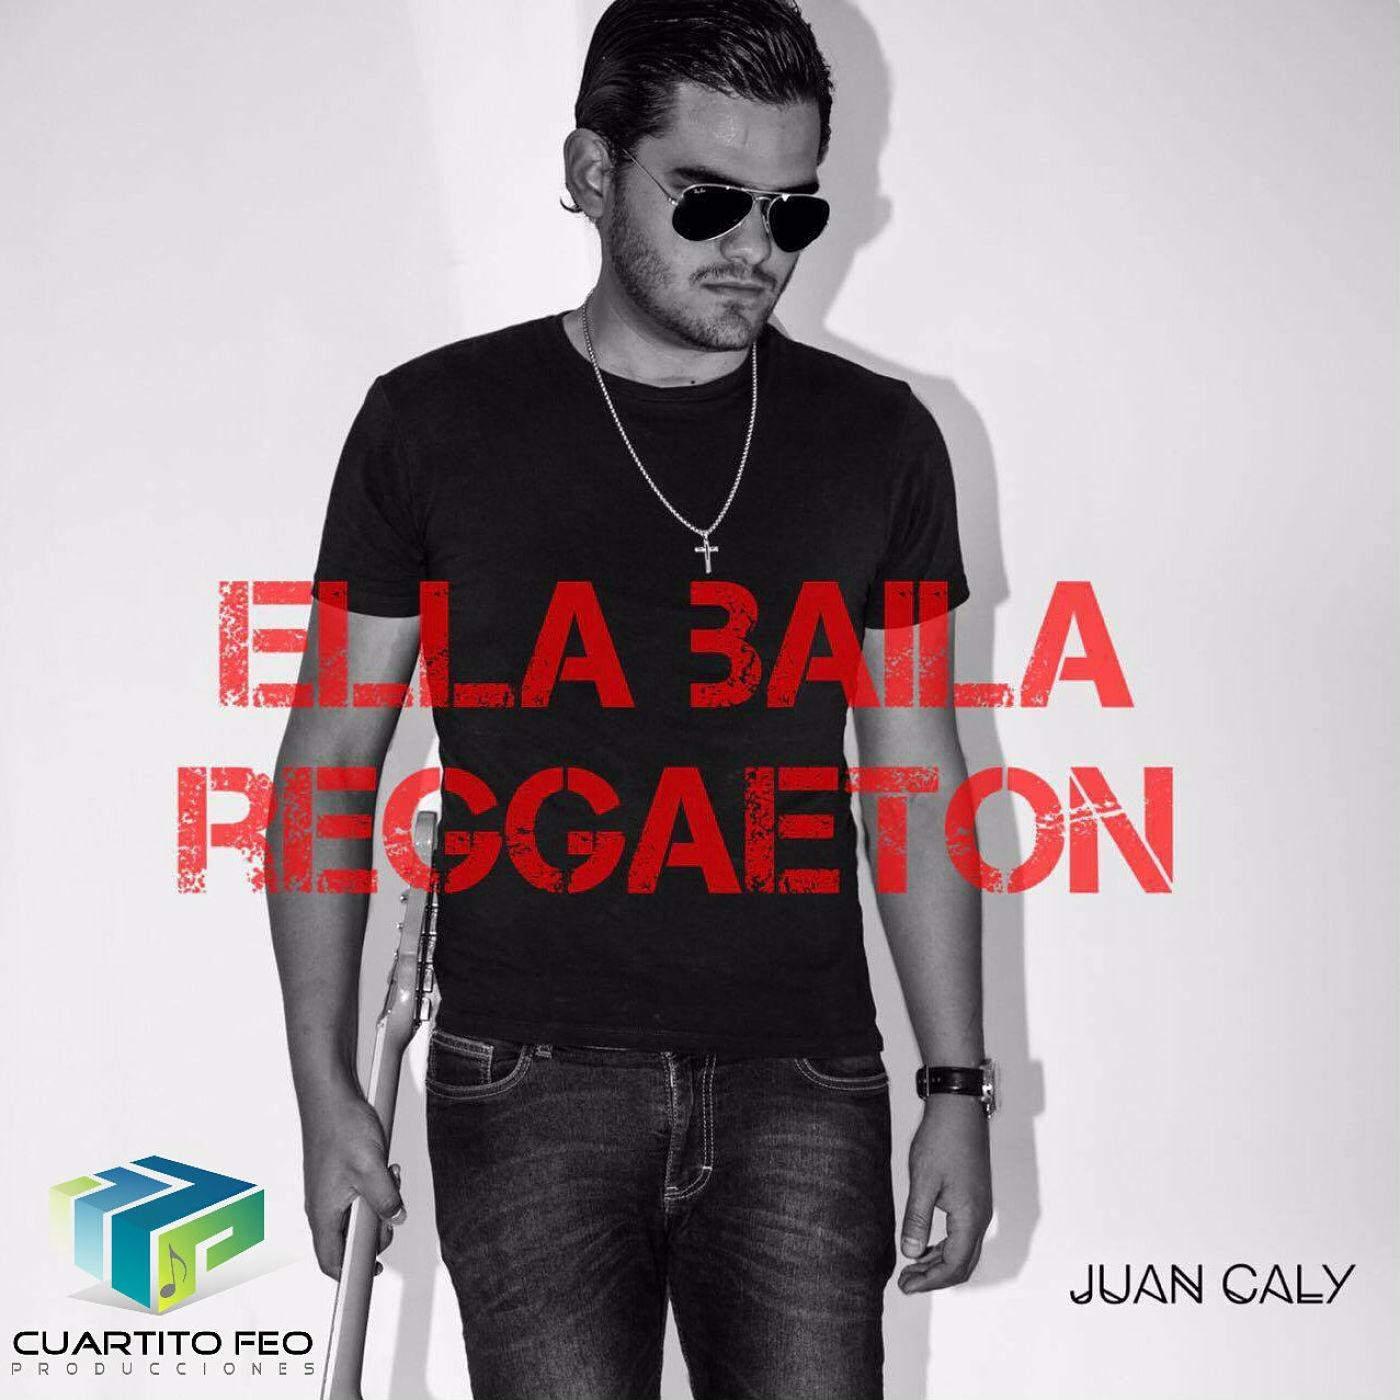 Ella Baila Reggaetón (Single) - Juan Caly